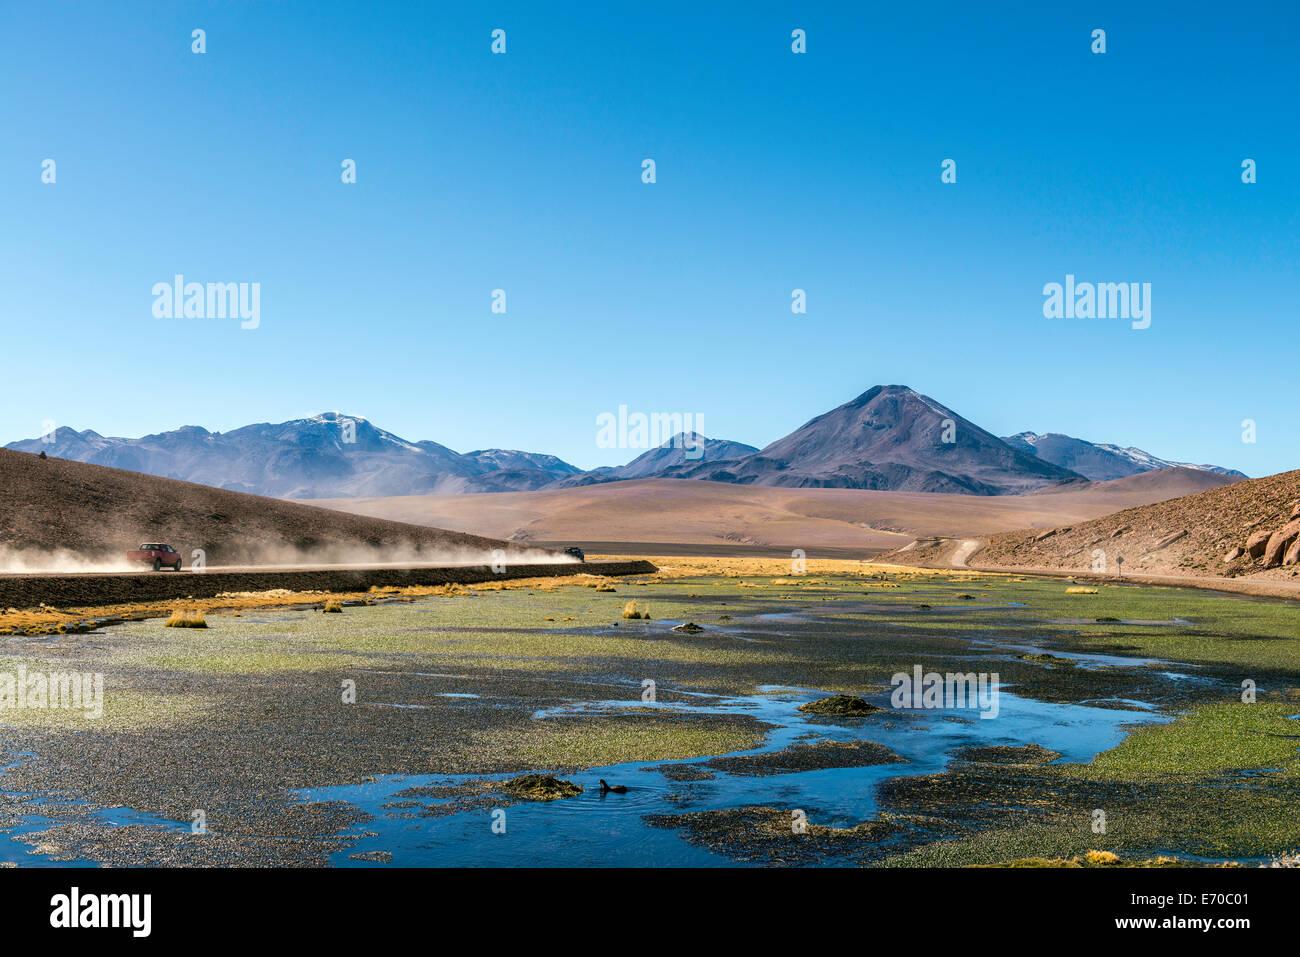 Putana river San Pedro de Atacama Chile South America - Stock Image